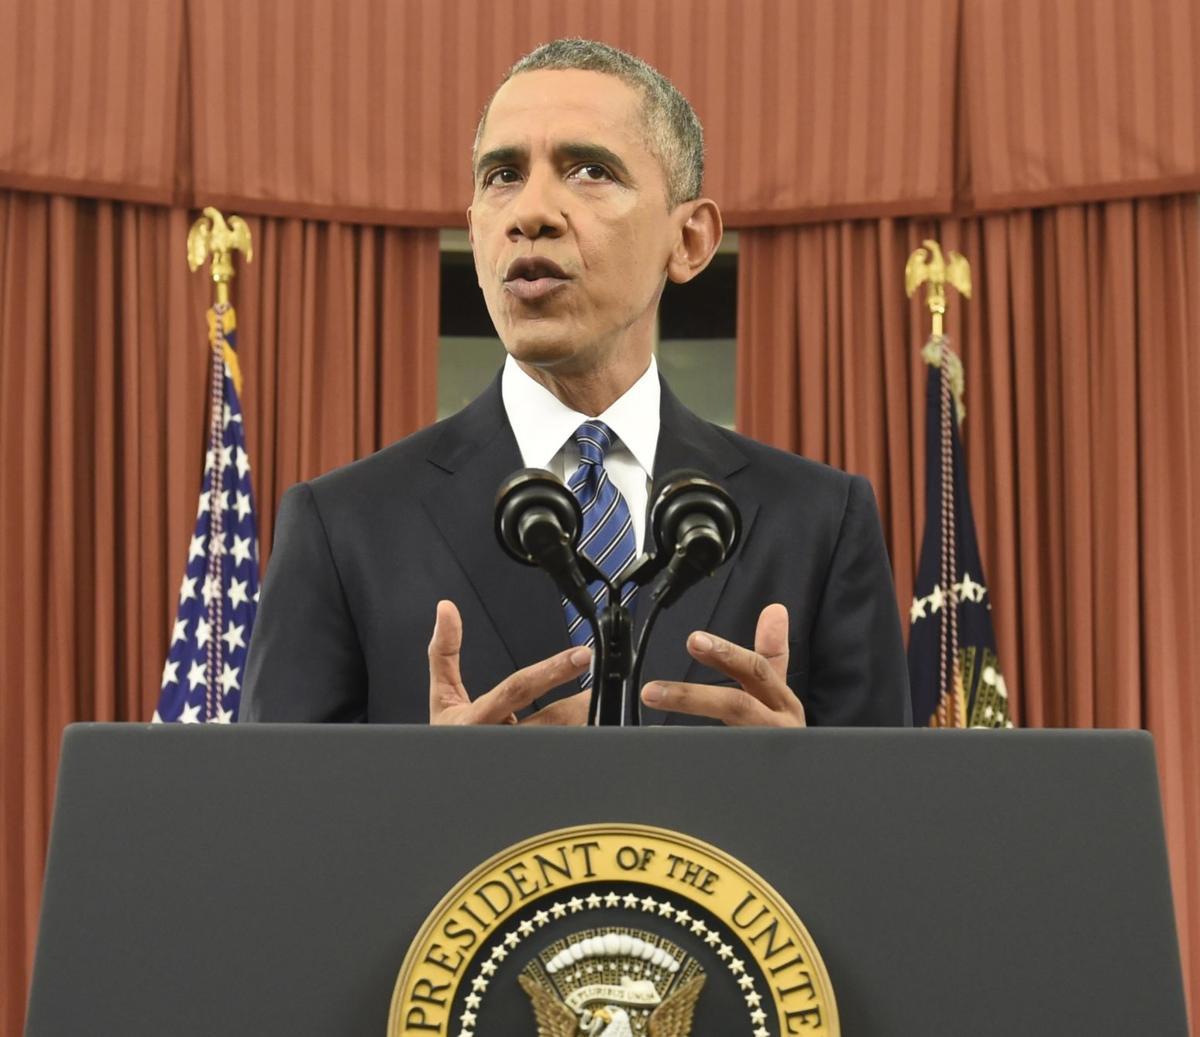 Obama: Terror threat against U.S. has entered 'new phase'